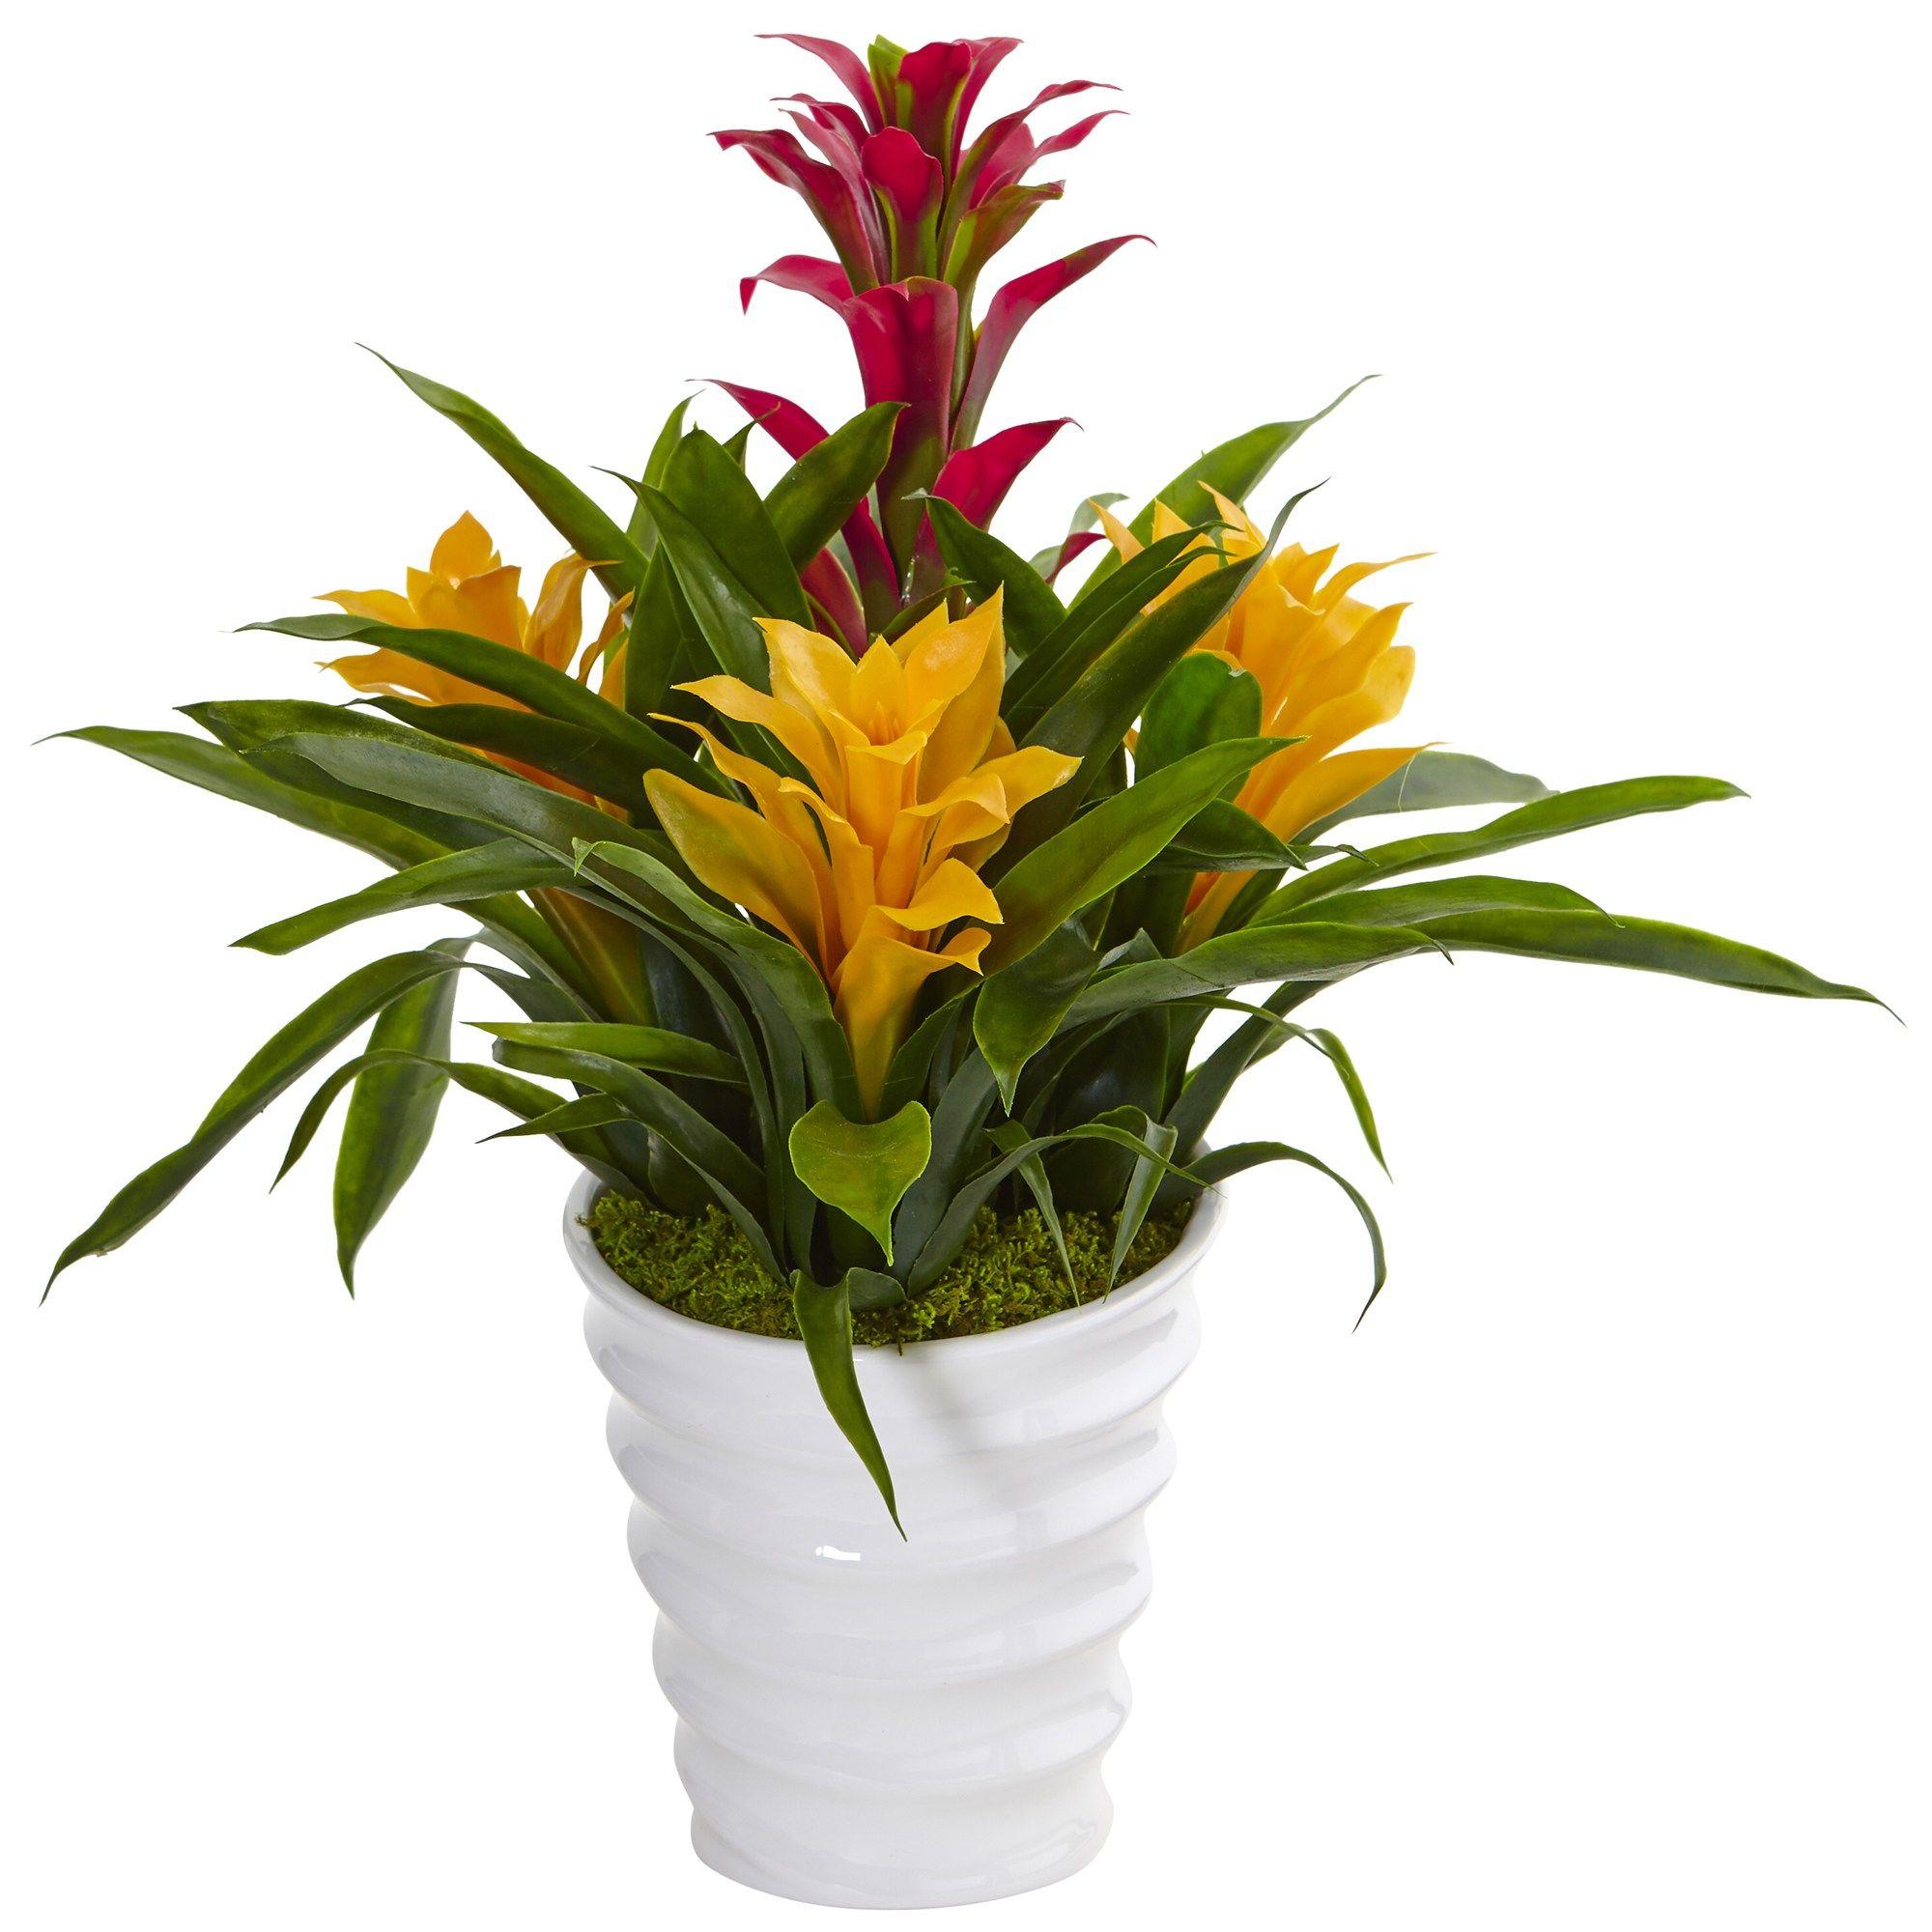 17 H Bromeliad In White Swirl Vase